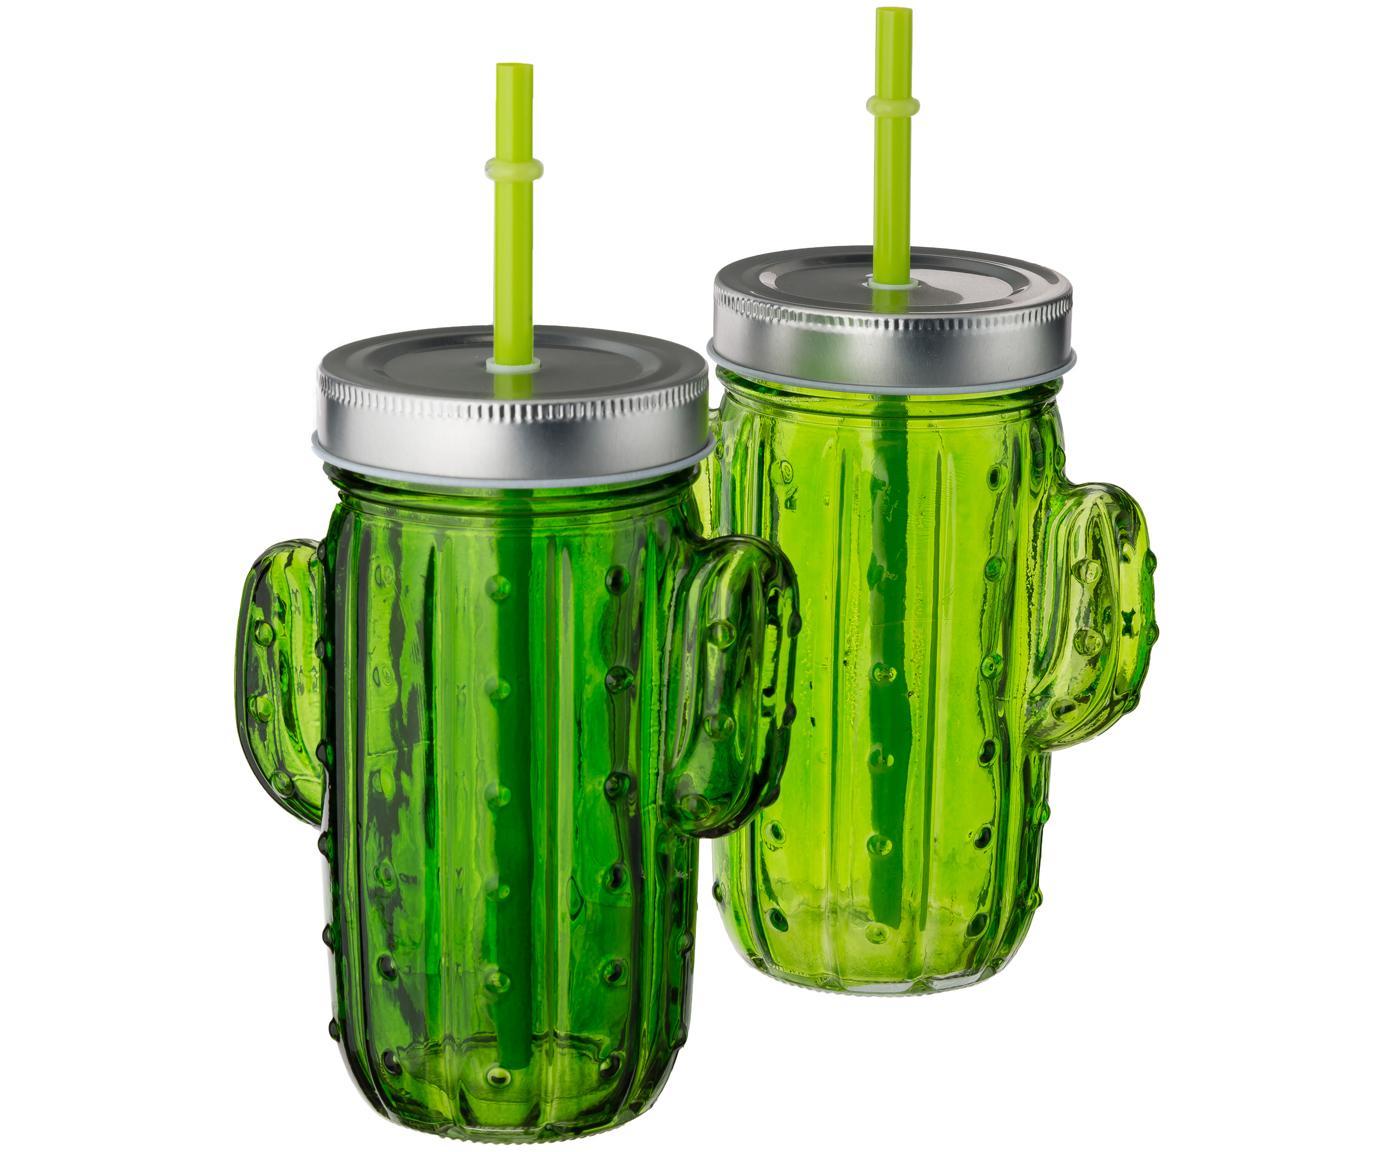 Vasos de cóctel Kaktus, 2uds., Tapa: metal, Verde, An 12 x Al 15 cm